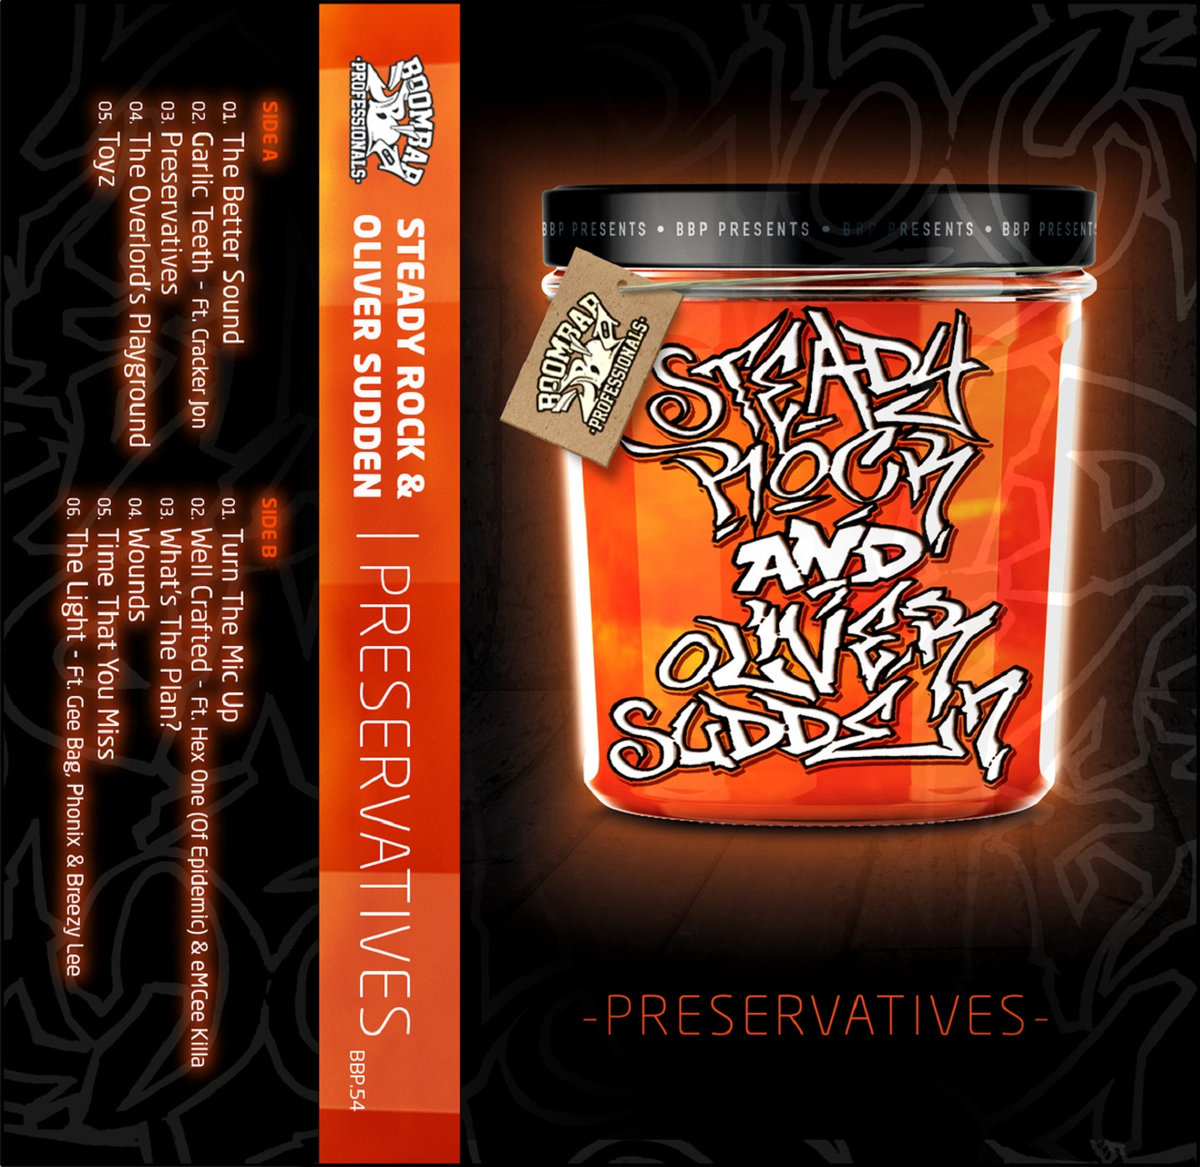 Steady_rock___oliver_sudden_presentan_preservatives